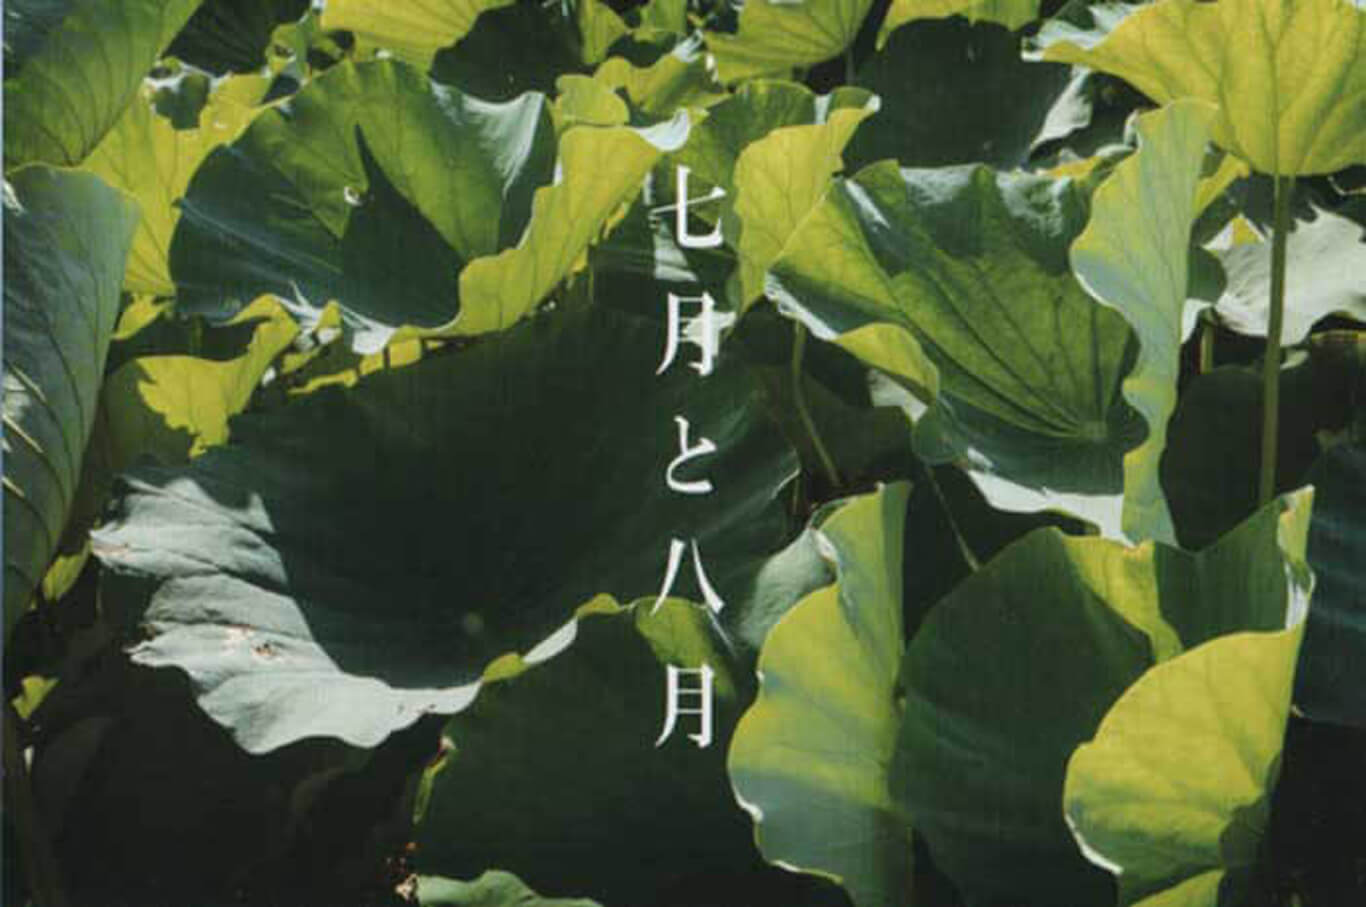 baku-201909-西島善和-写真展